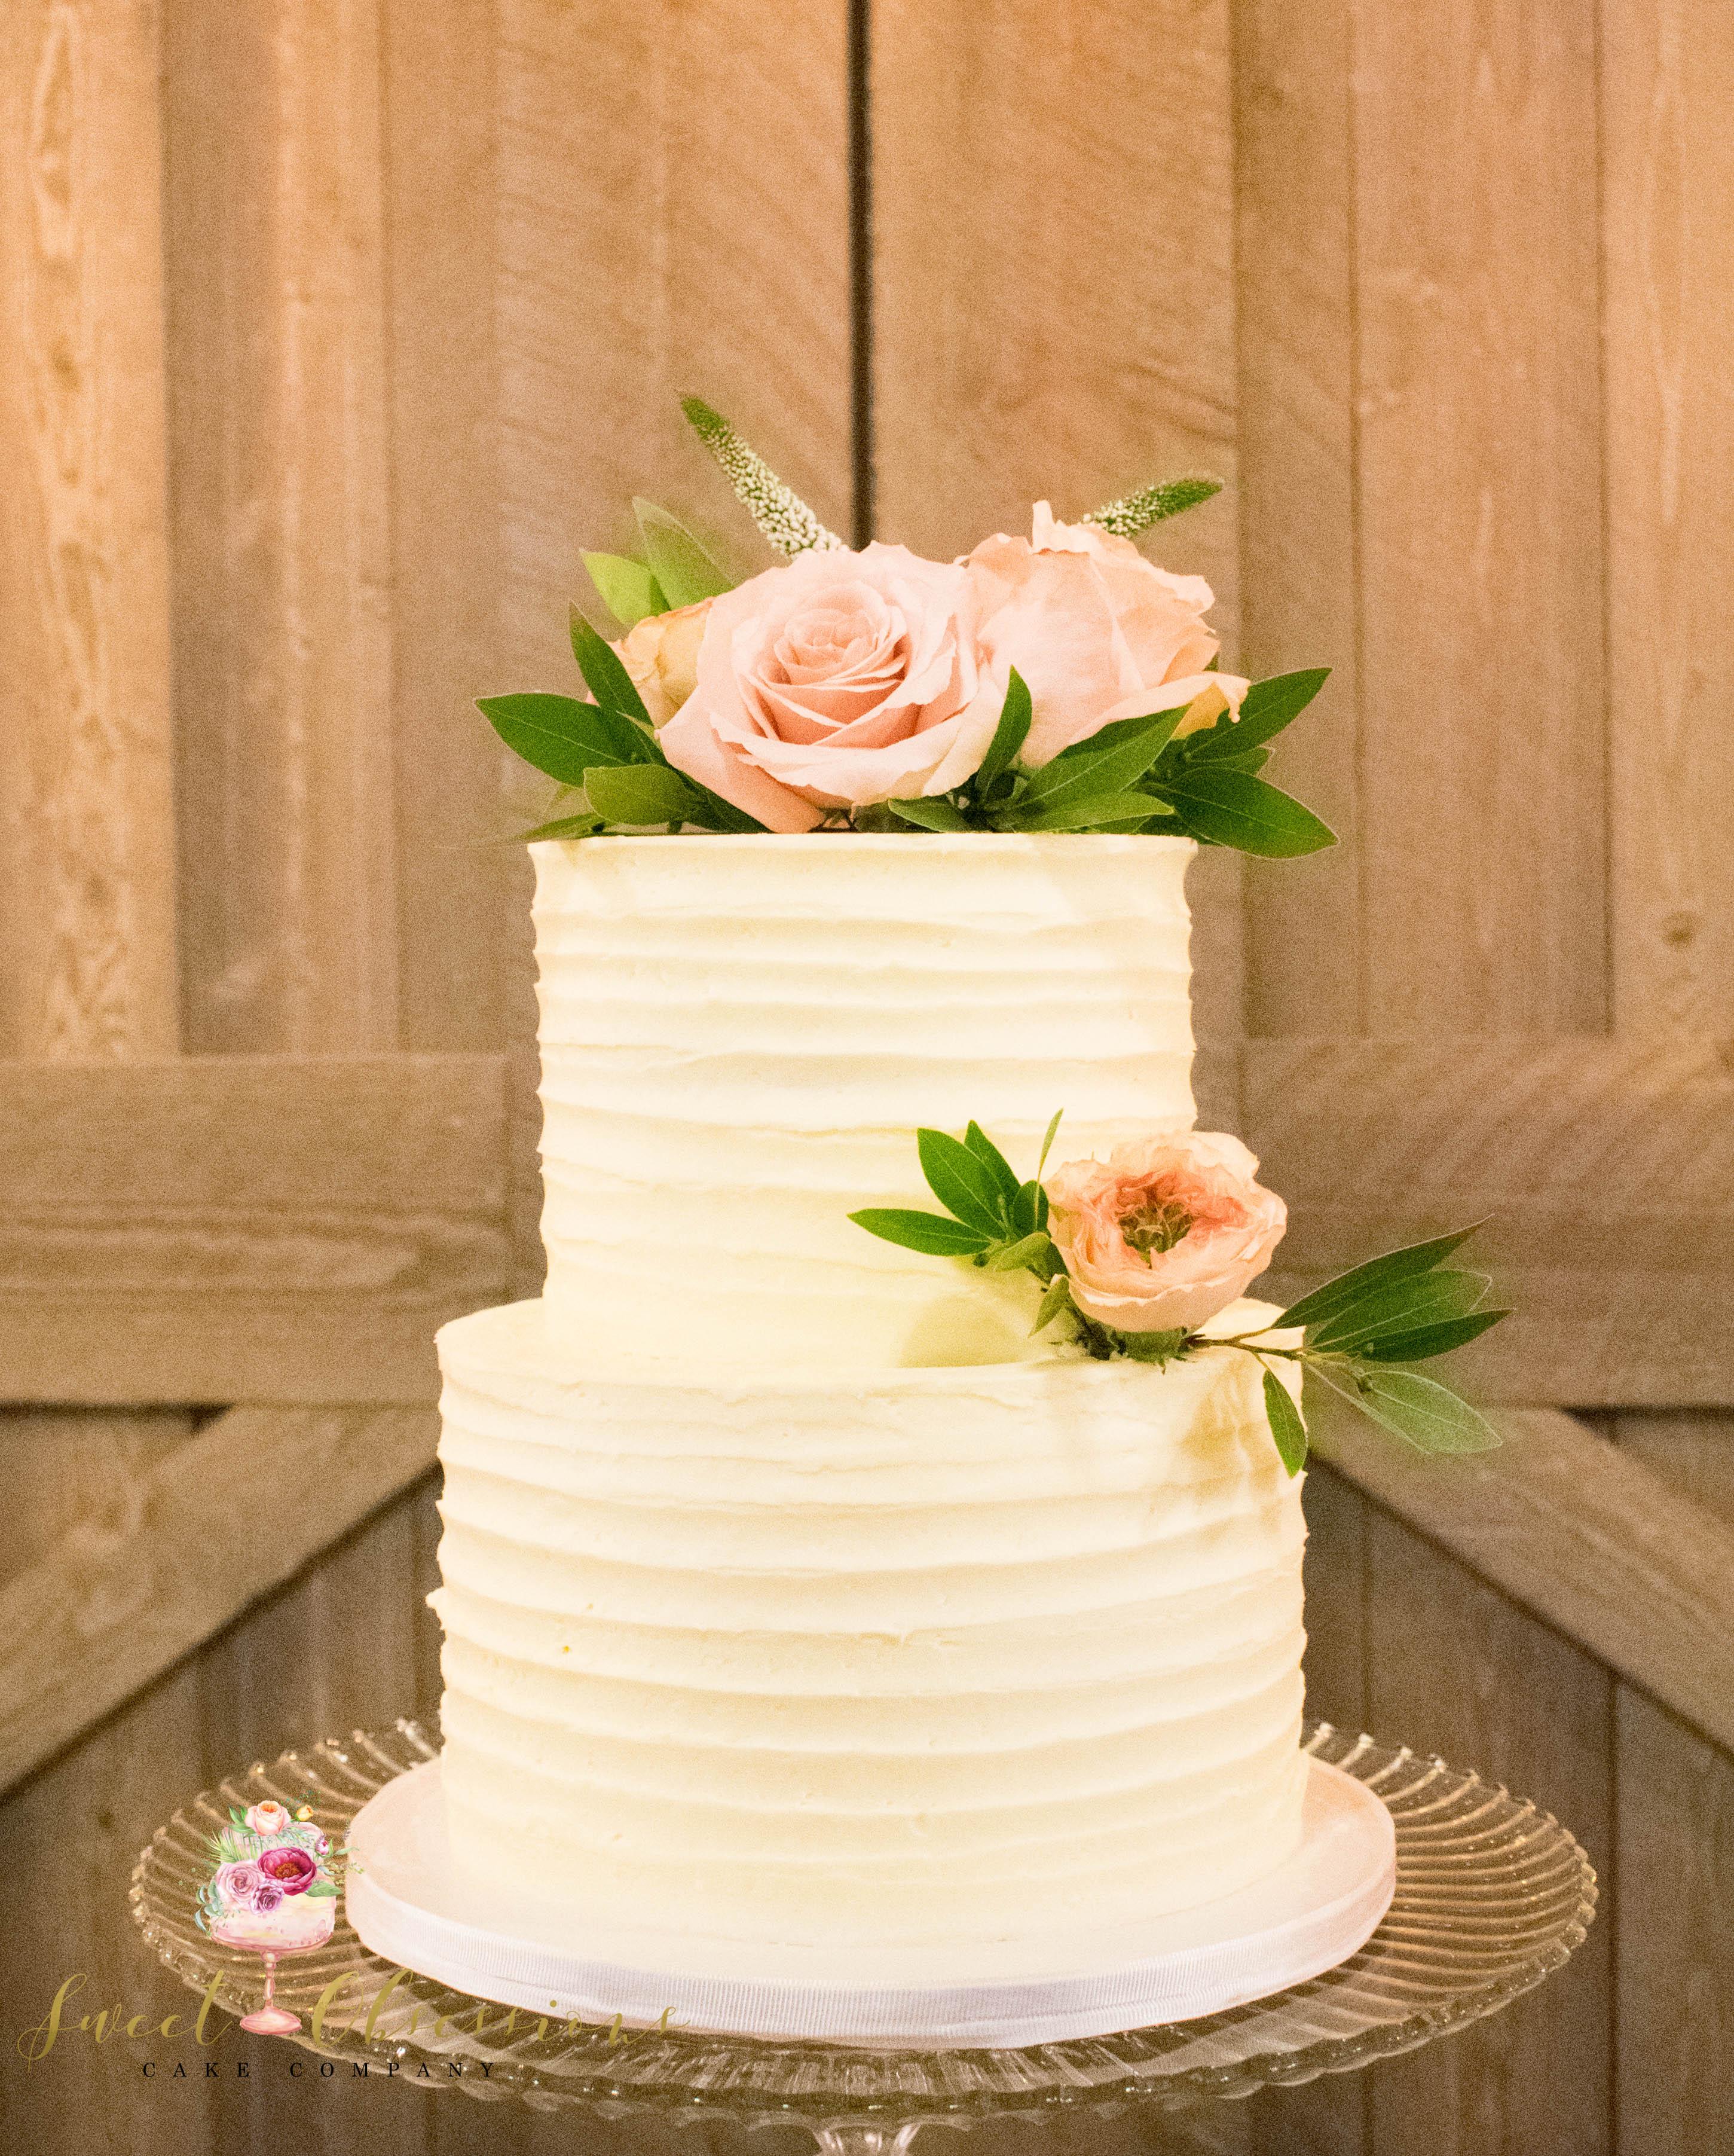 Simple Texture Wedding Cake